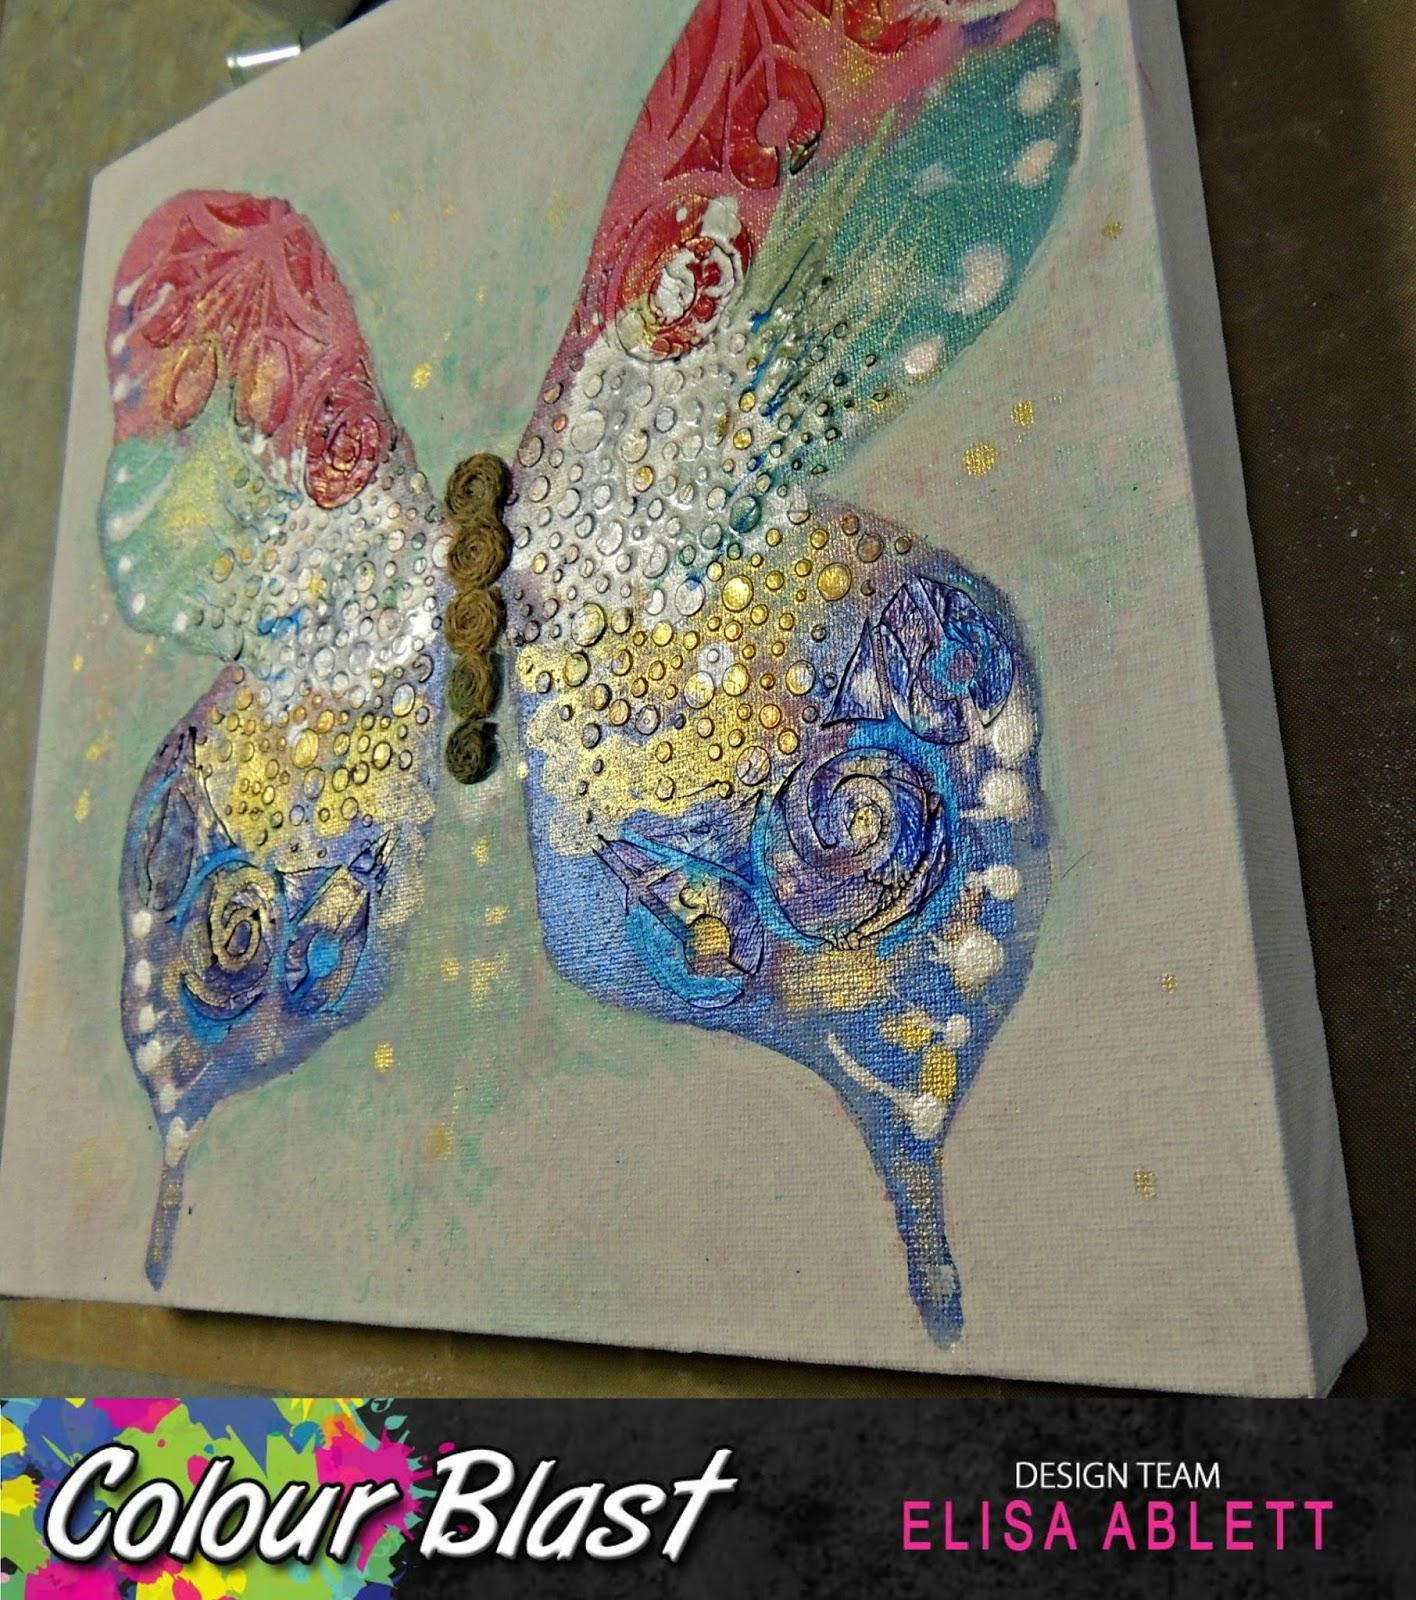 colour blast butterfly canvas by elisa ablett